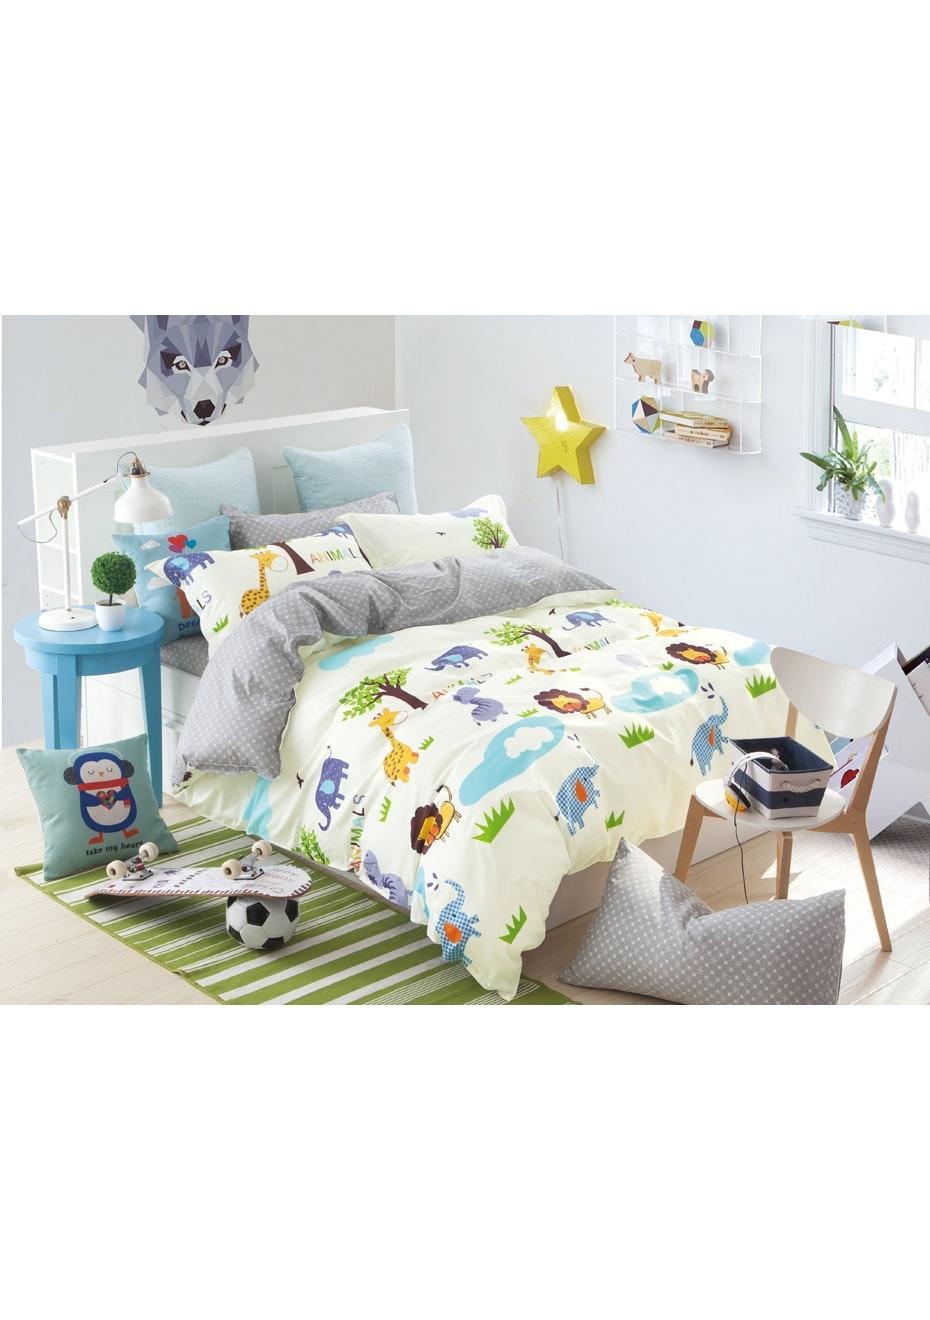 Safari Quilt Cover Set - Reversible Design - 100% Cotton - Single Bed